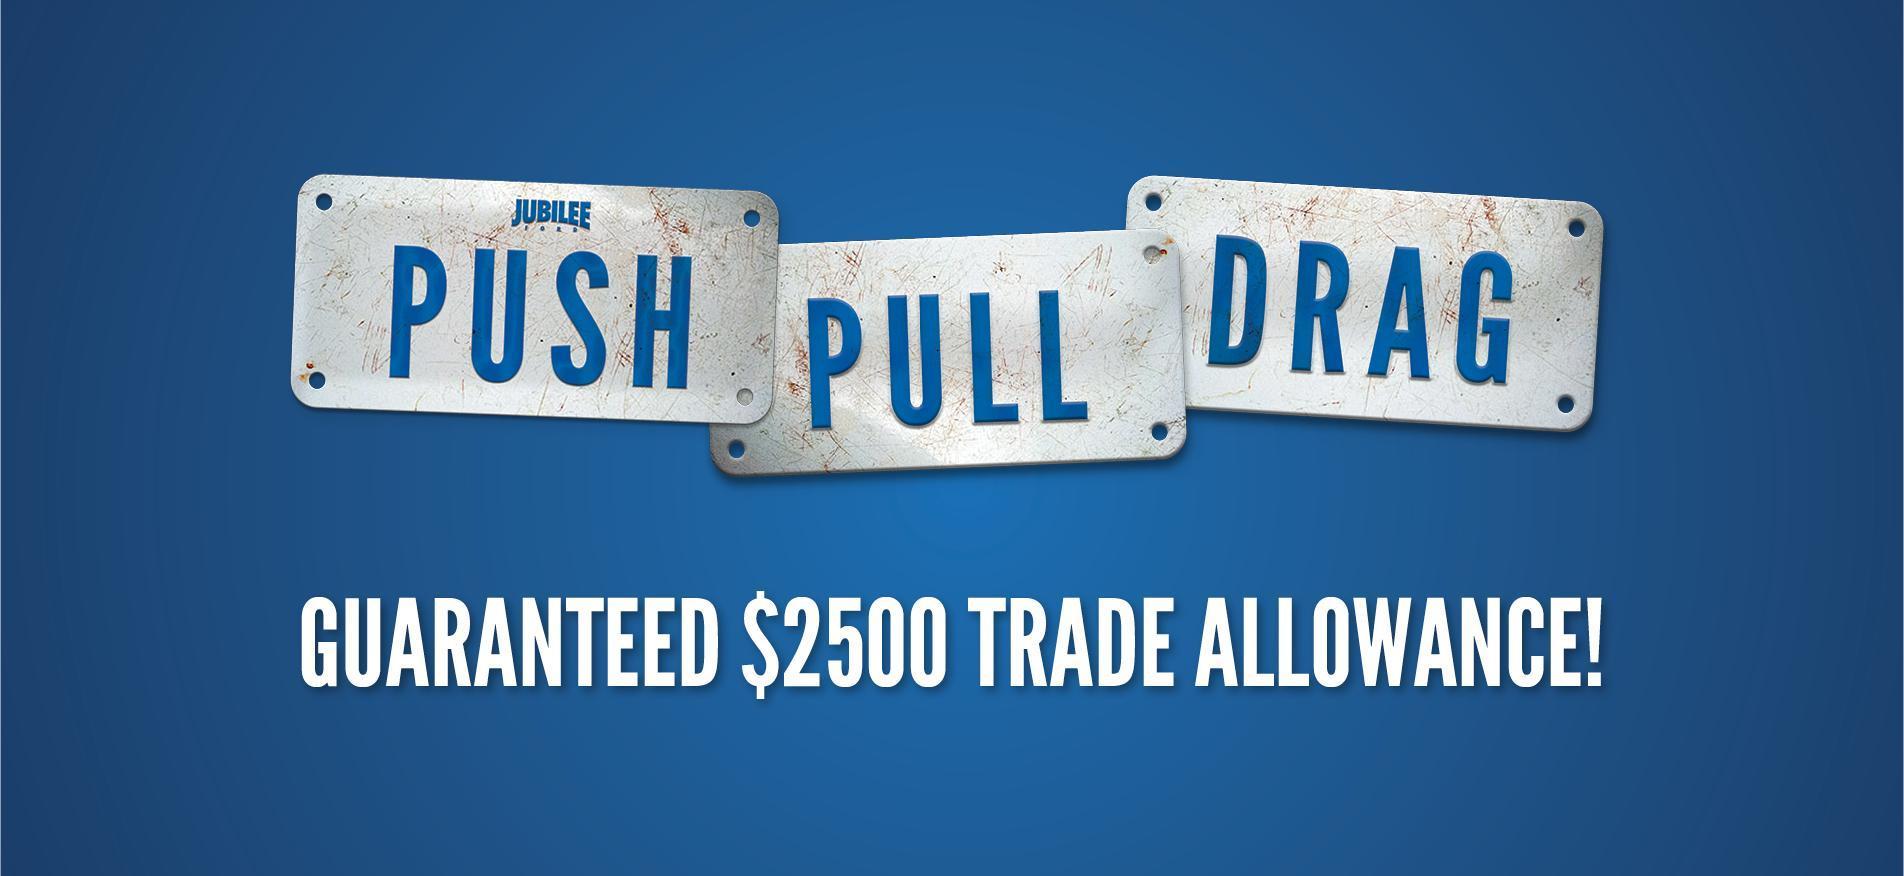 Push Pull Drag Jubilee Ford